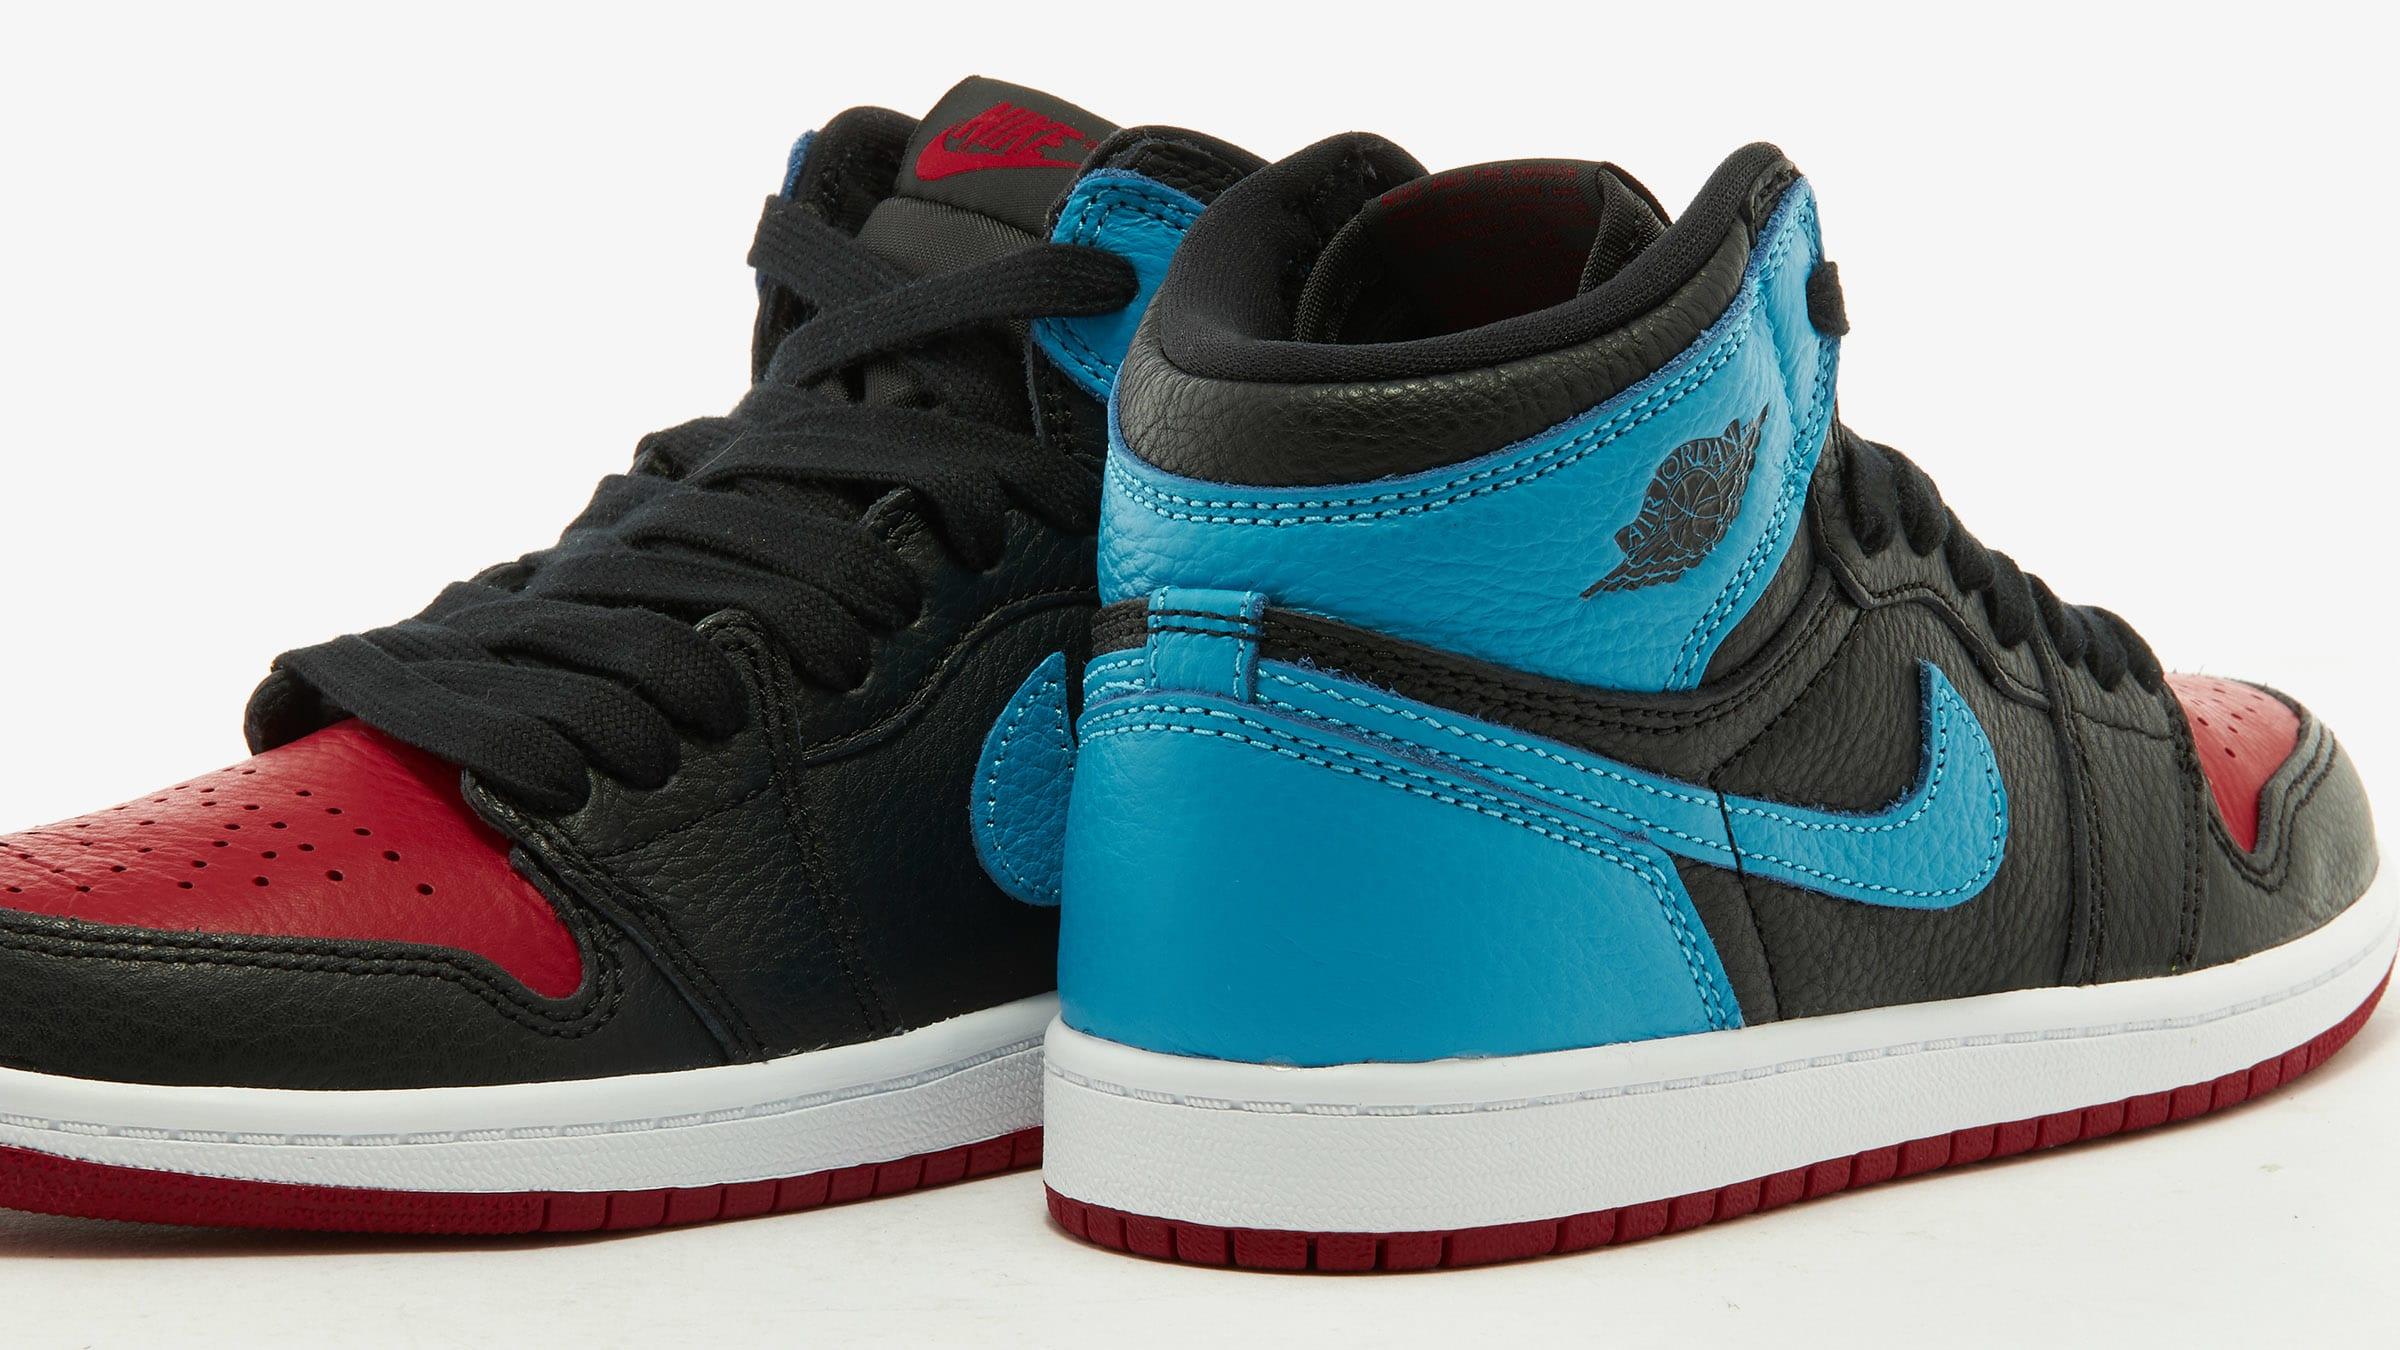 NIKE AIR JORDAN 1 HIGH OG PS BLACK/DK POWDER BLUE/GYM RED